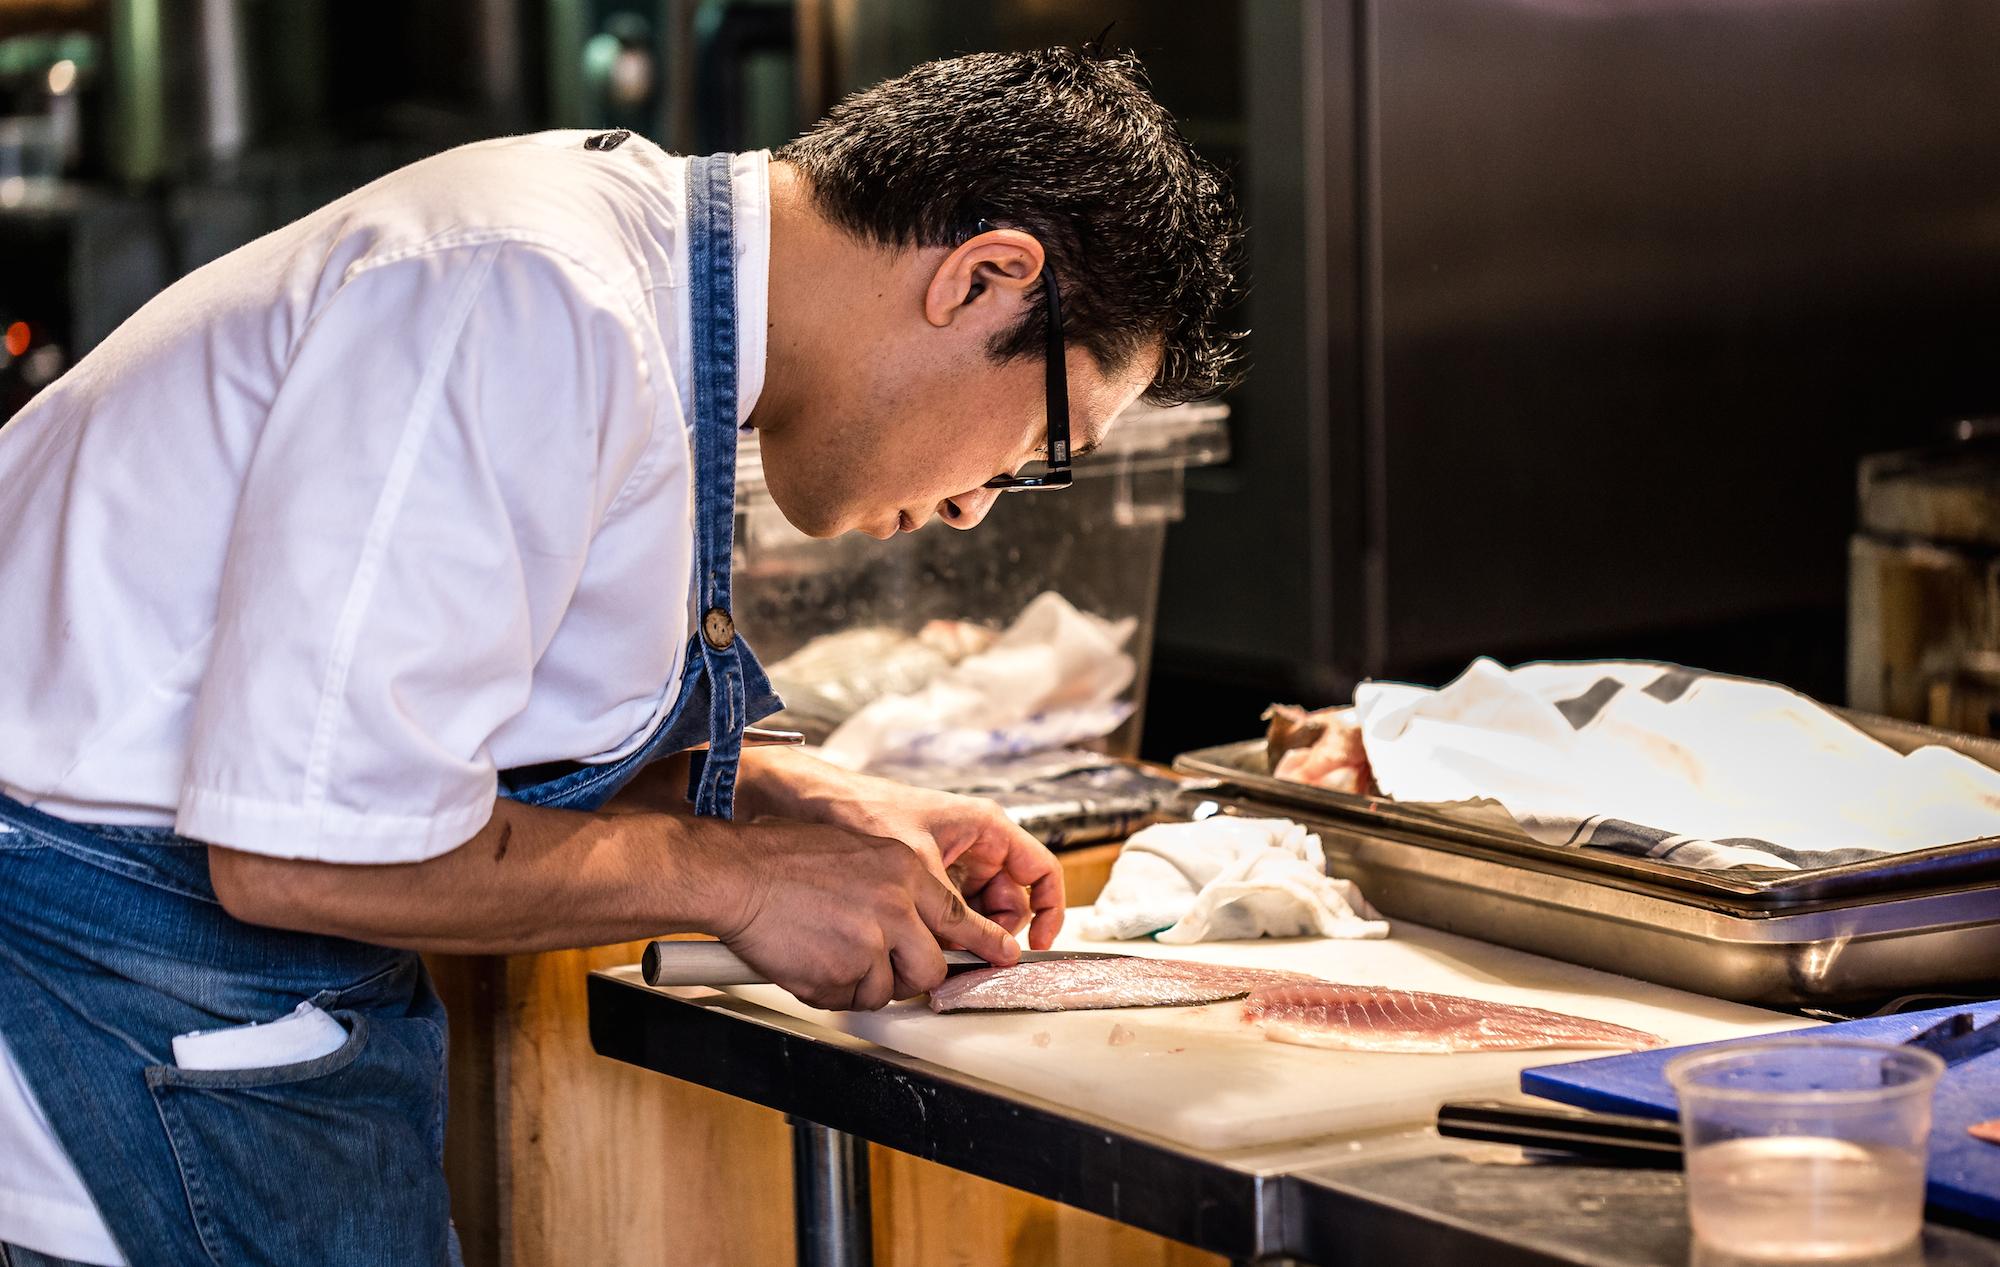 Chef Takeshi Horinoue